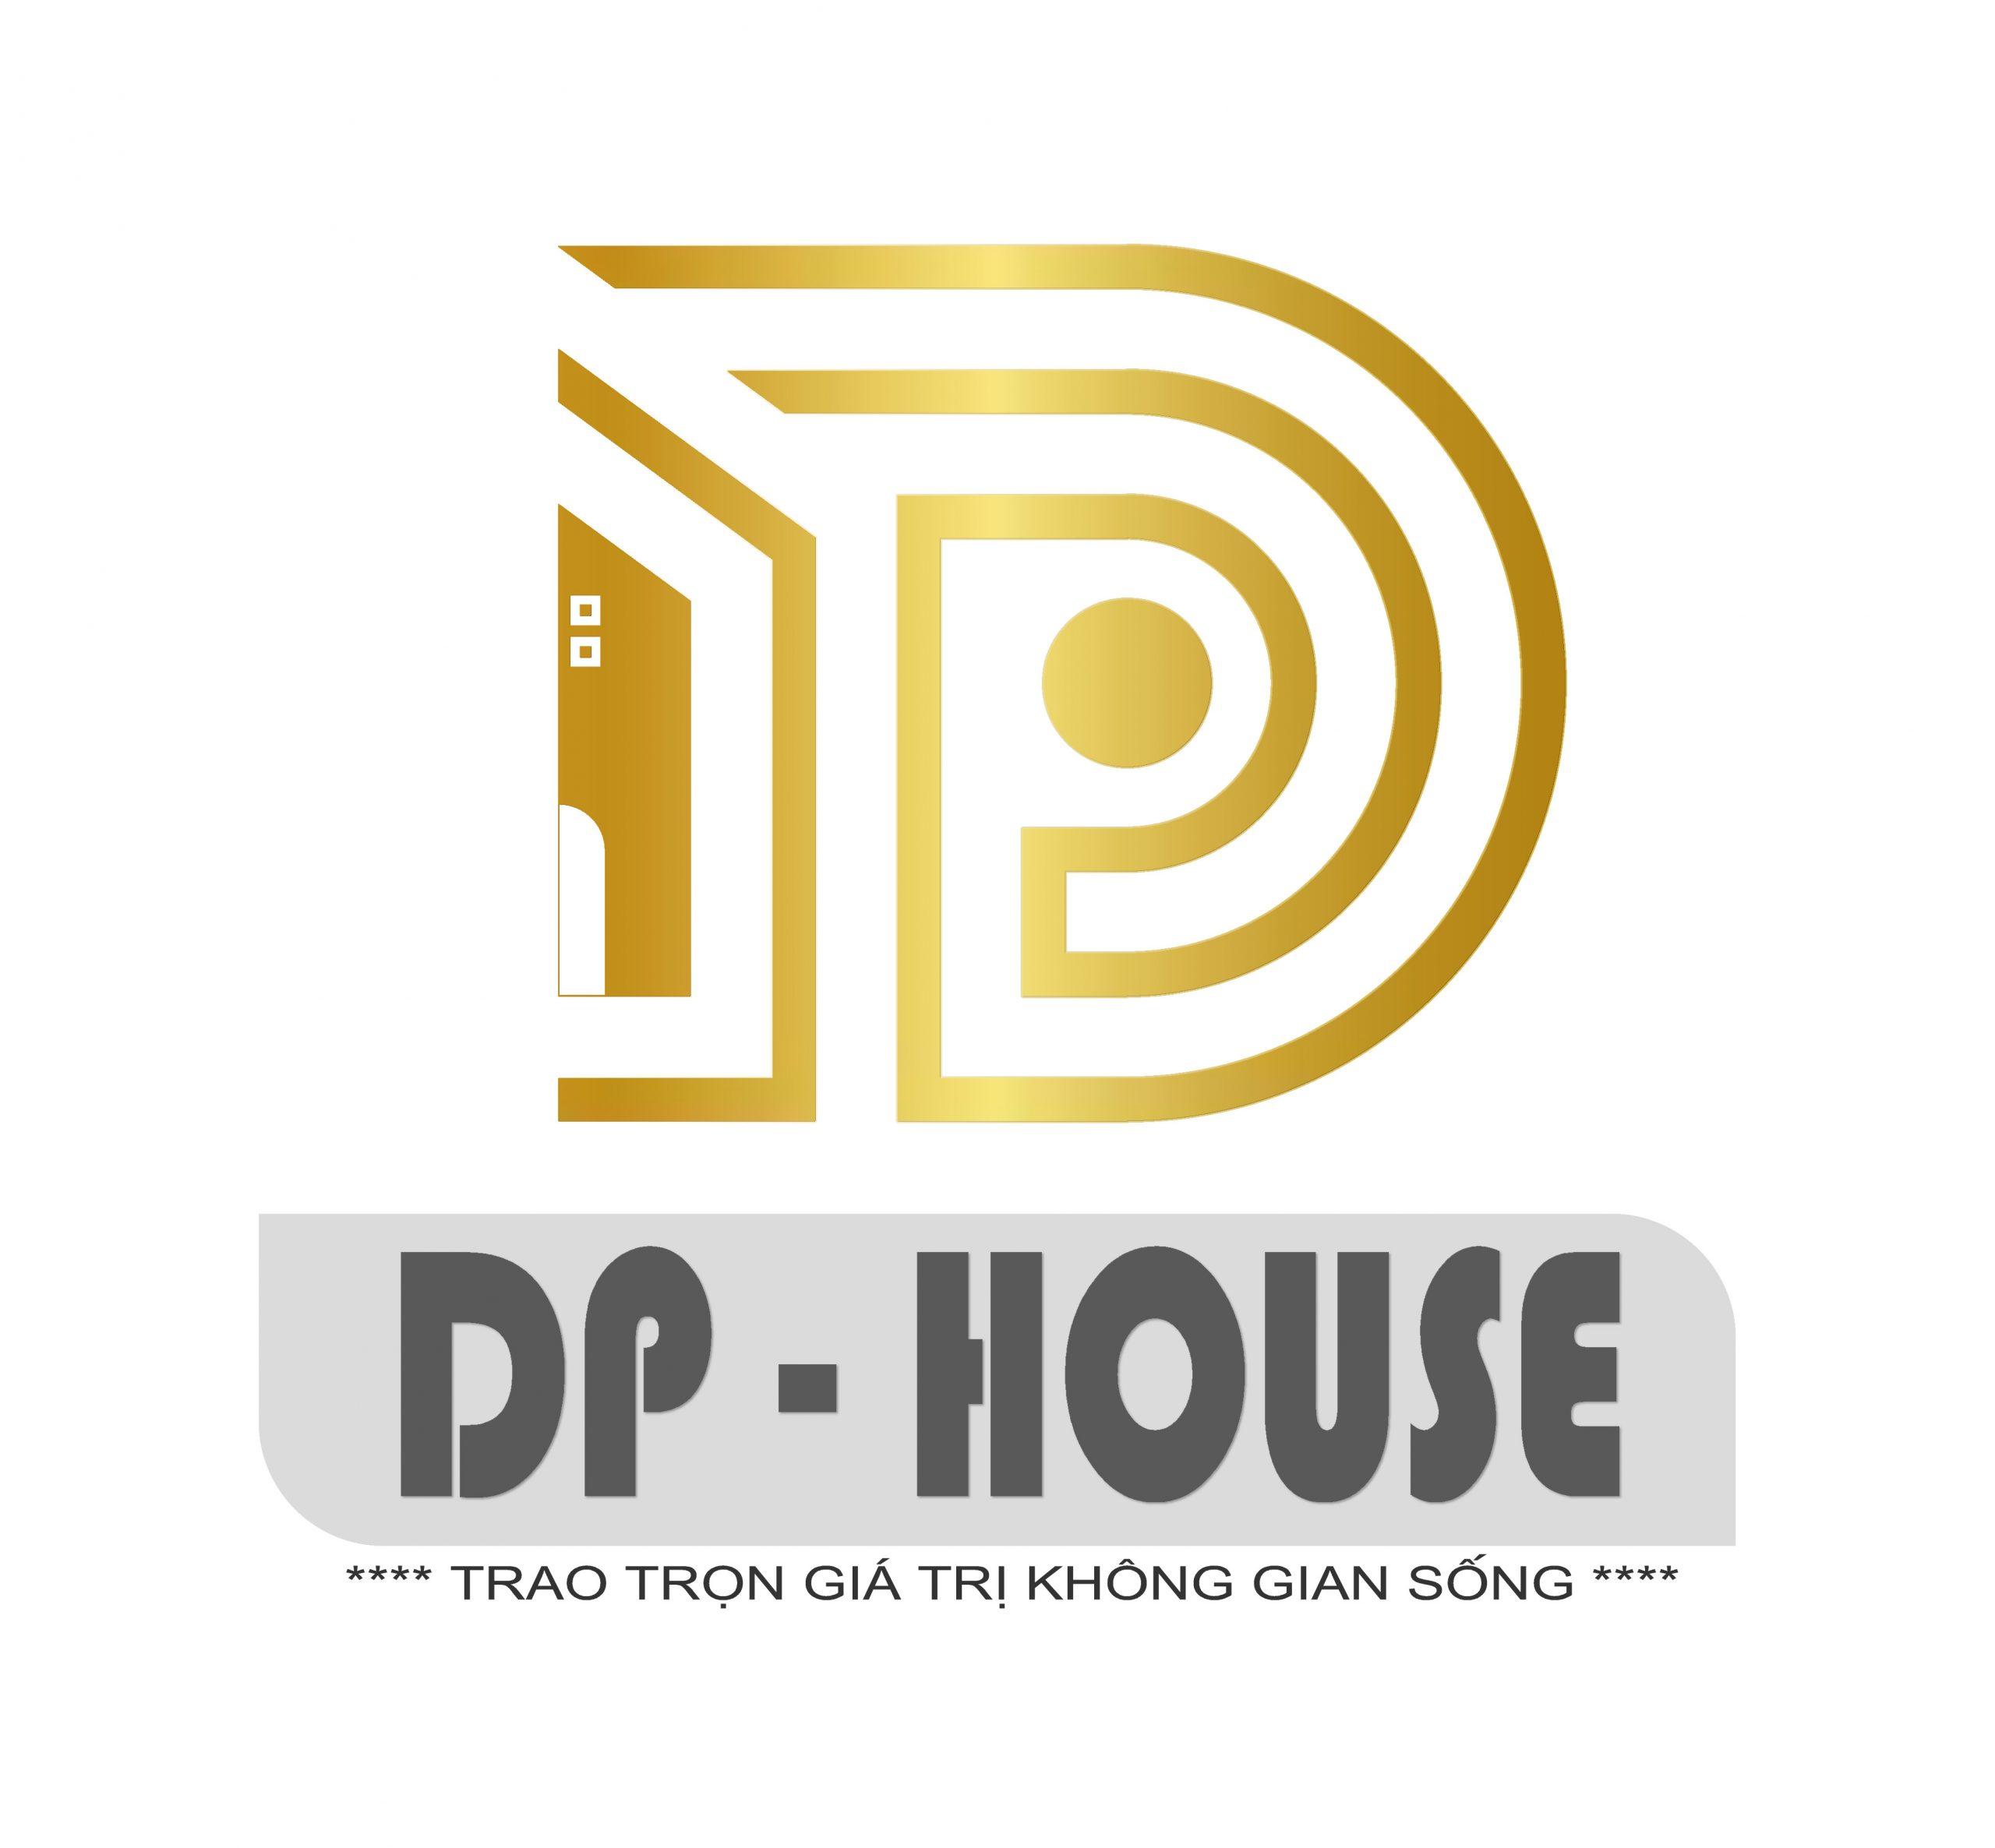 dphouse.vn